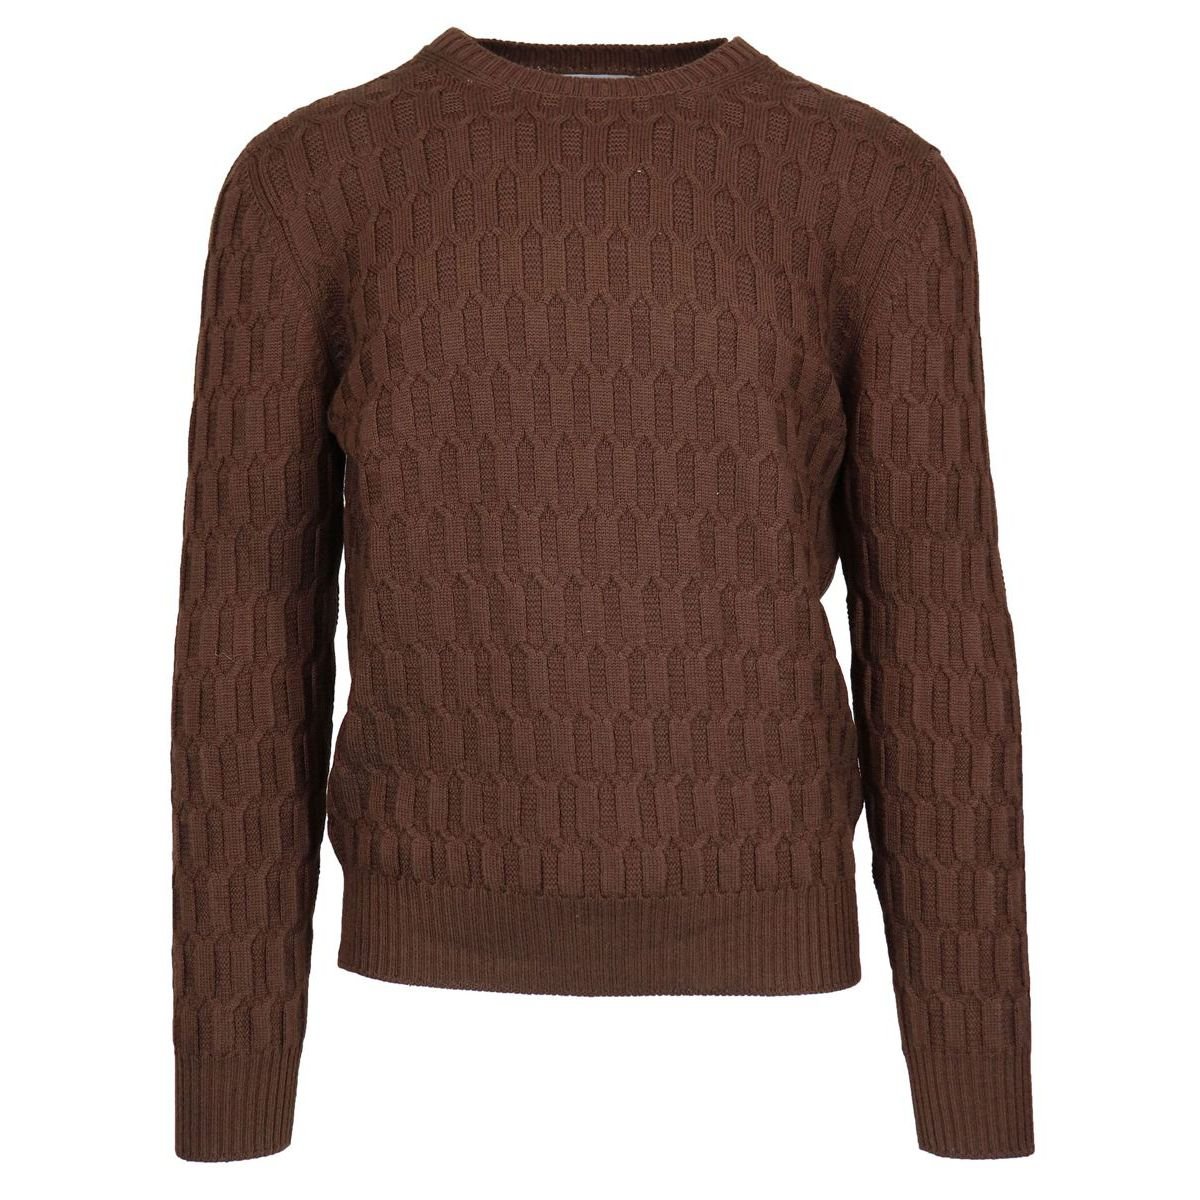 Crewneck wool crewneck pullover Moro Gran Sasso